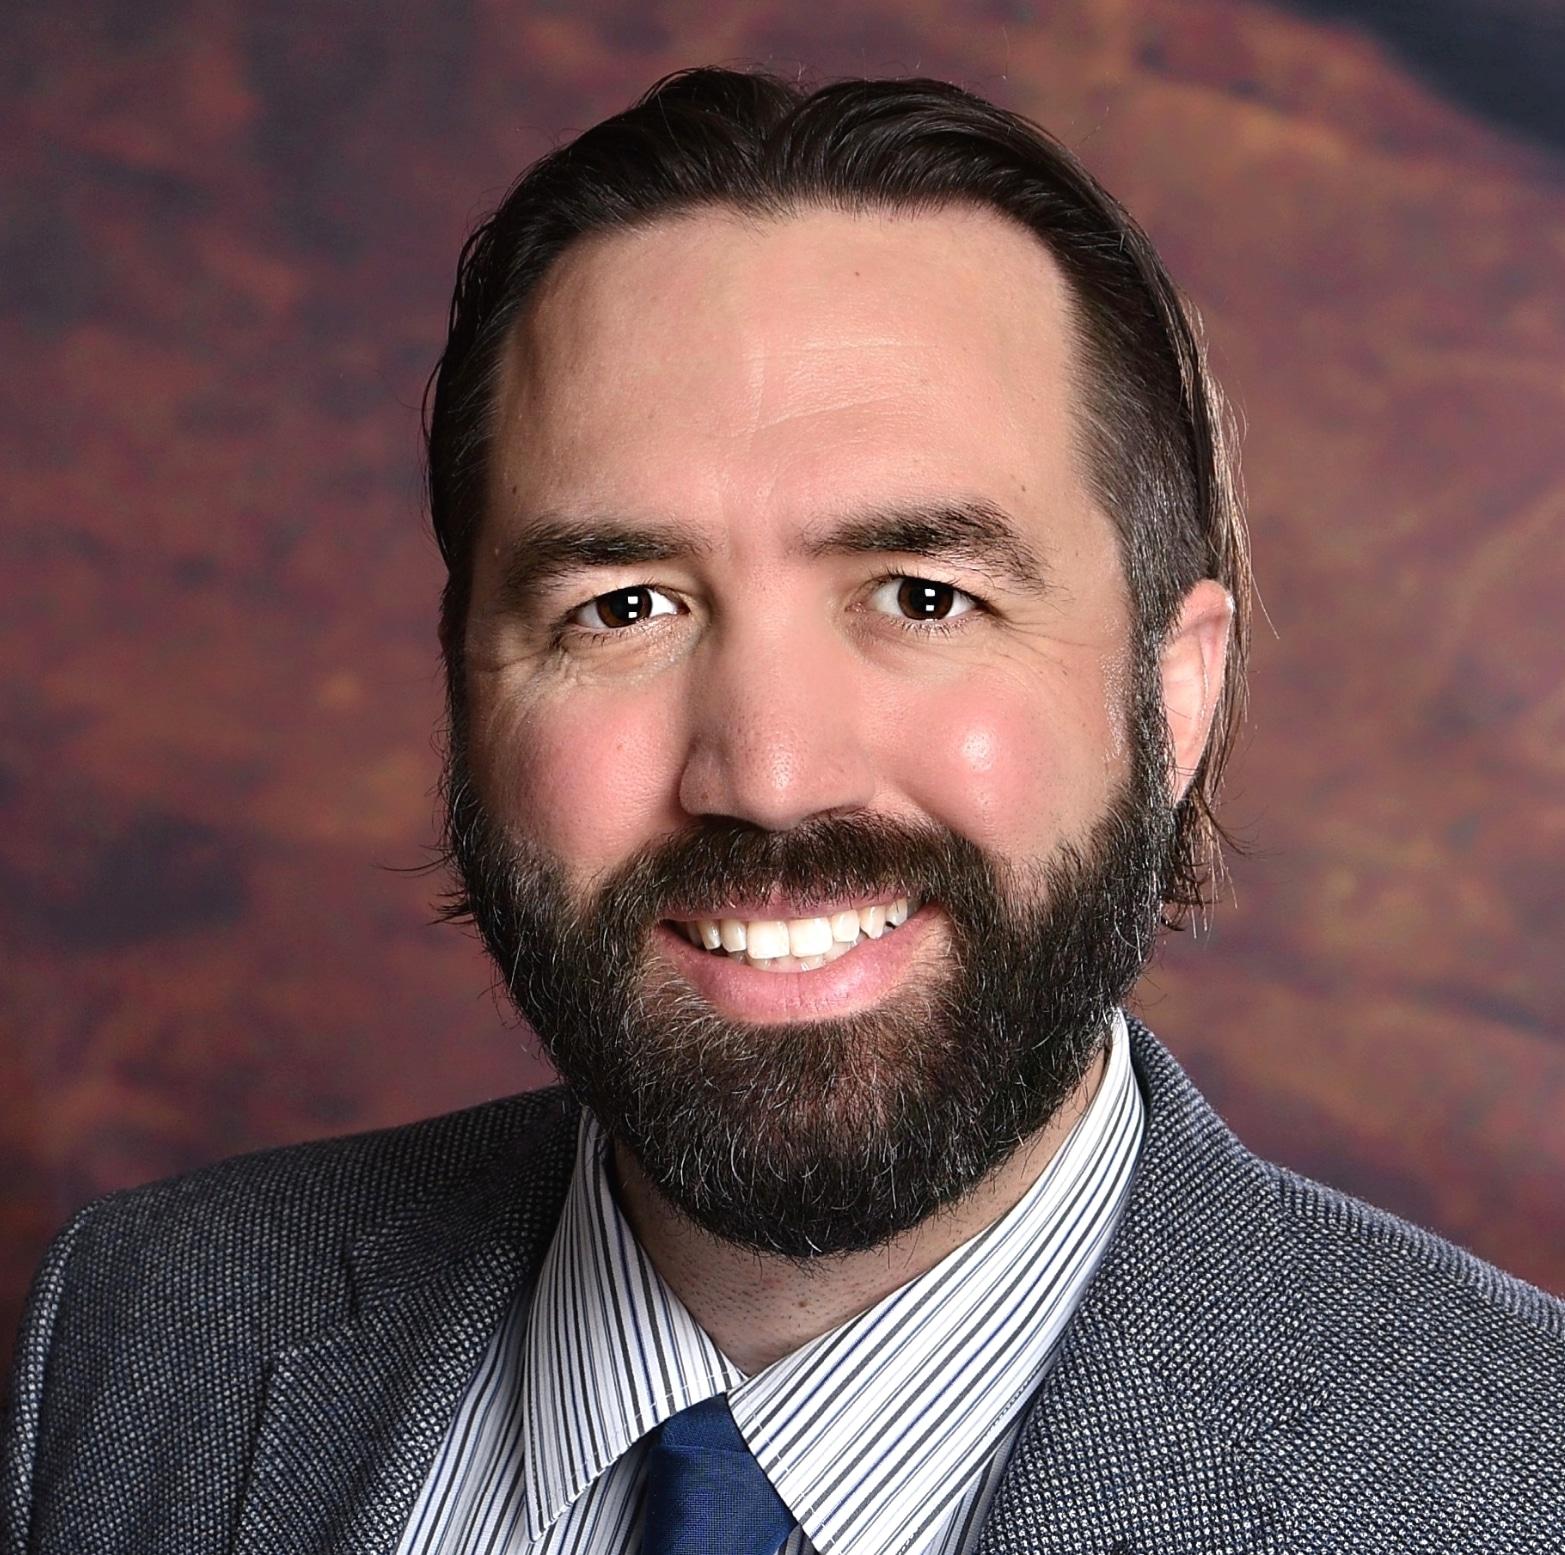 Jake Kouns Risk Based Security